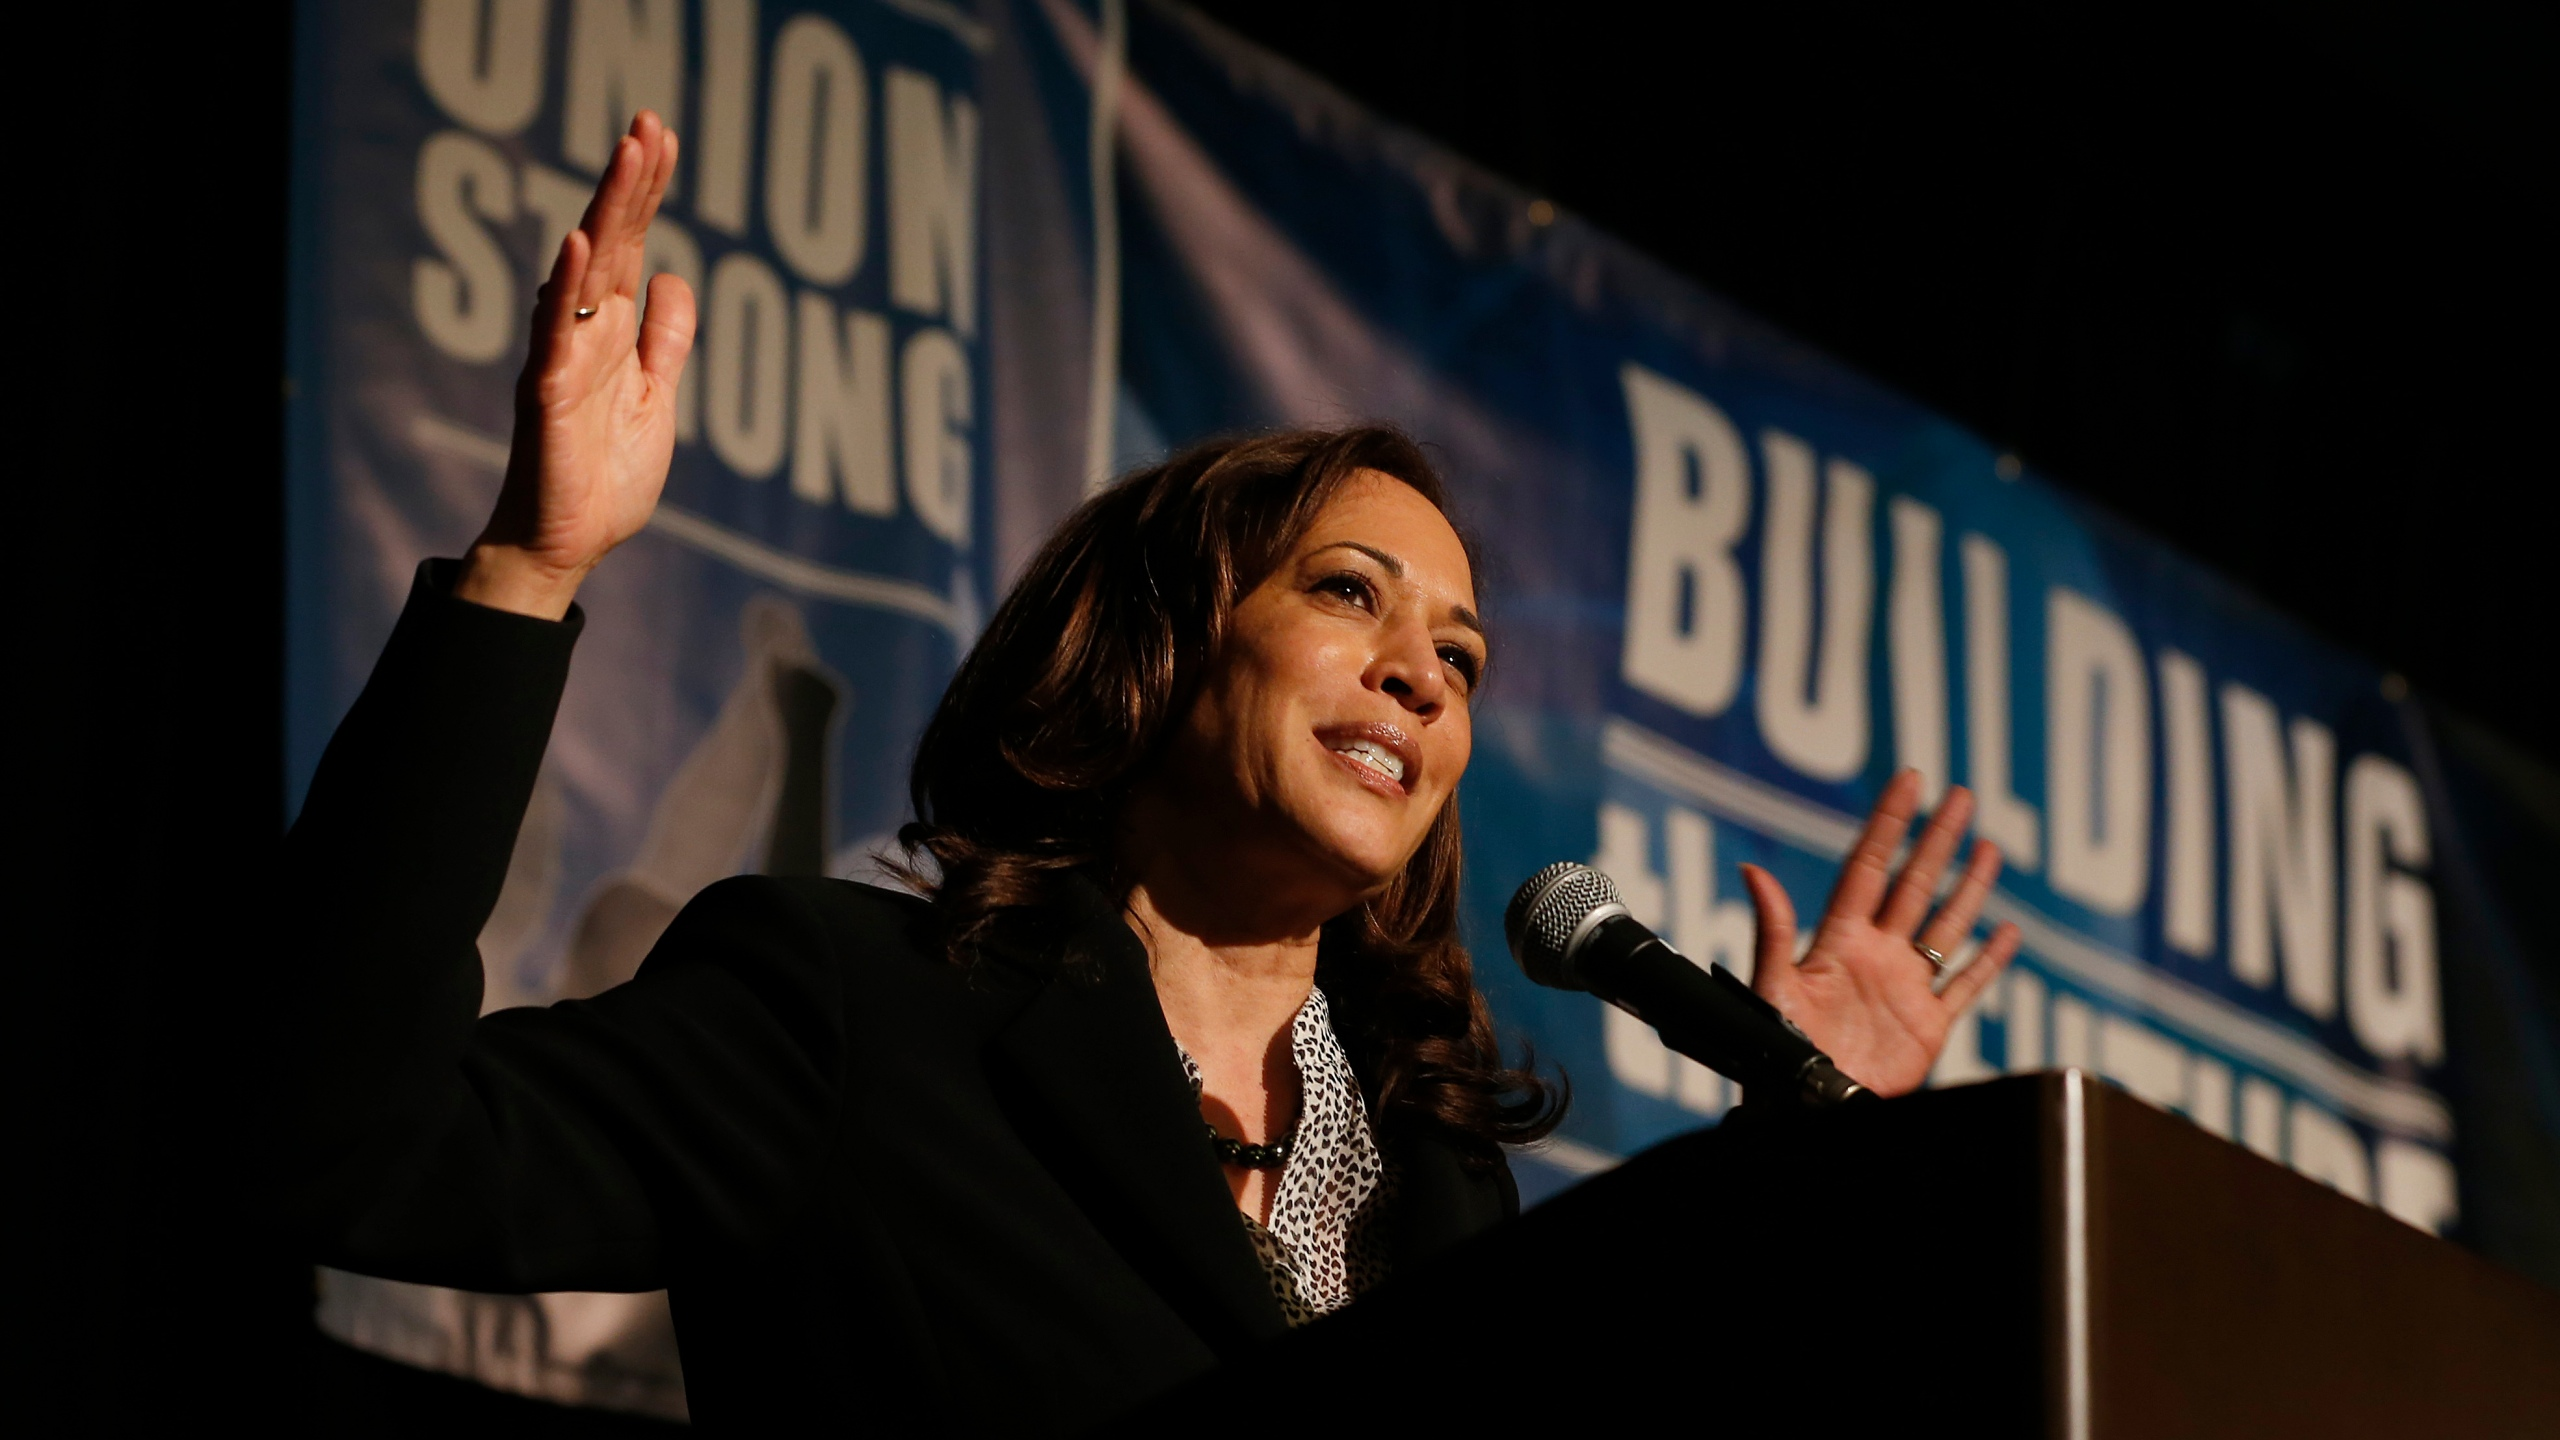 Election_2020-Kamala_Harris-California_93941-159532.jpg38072055